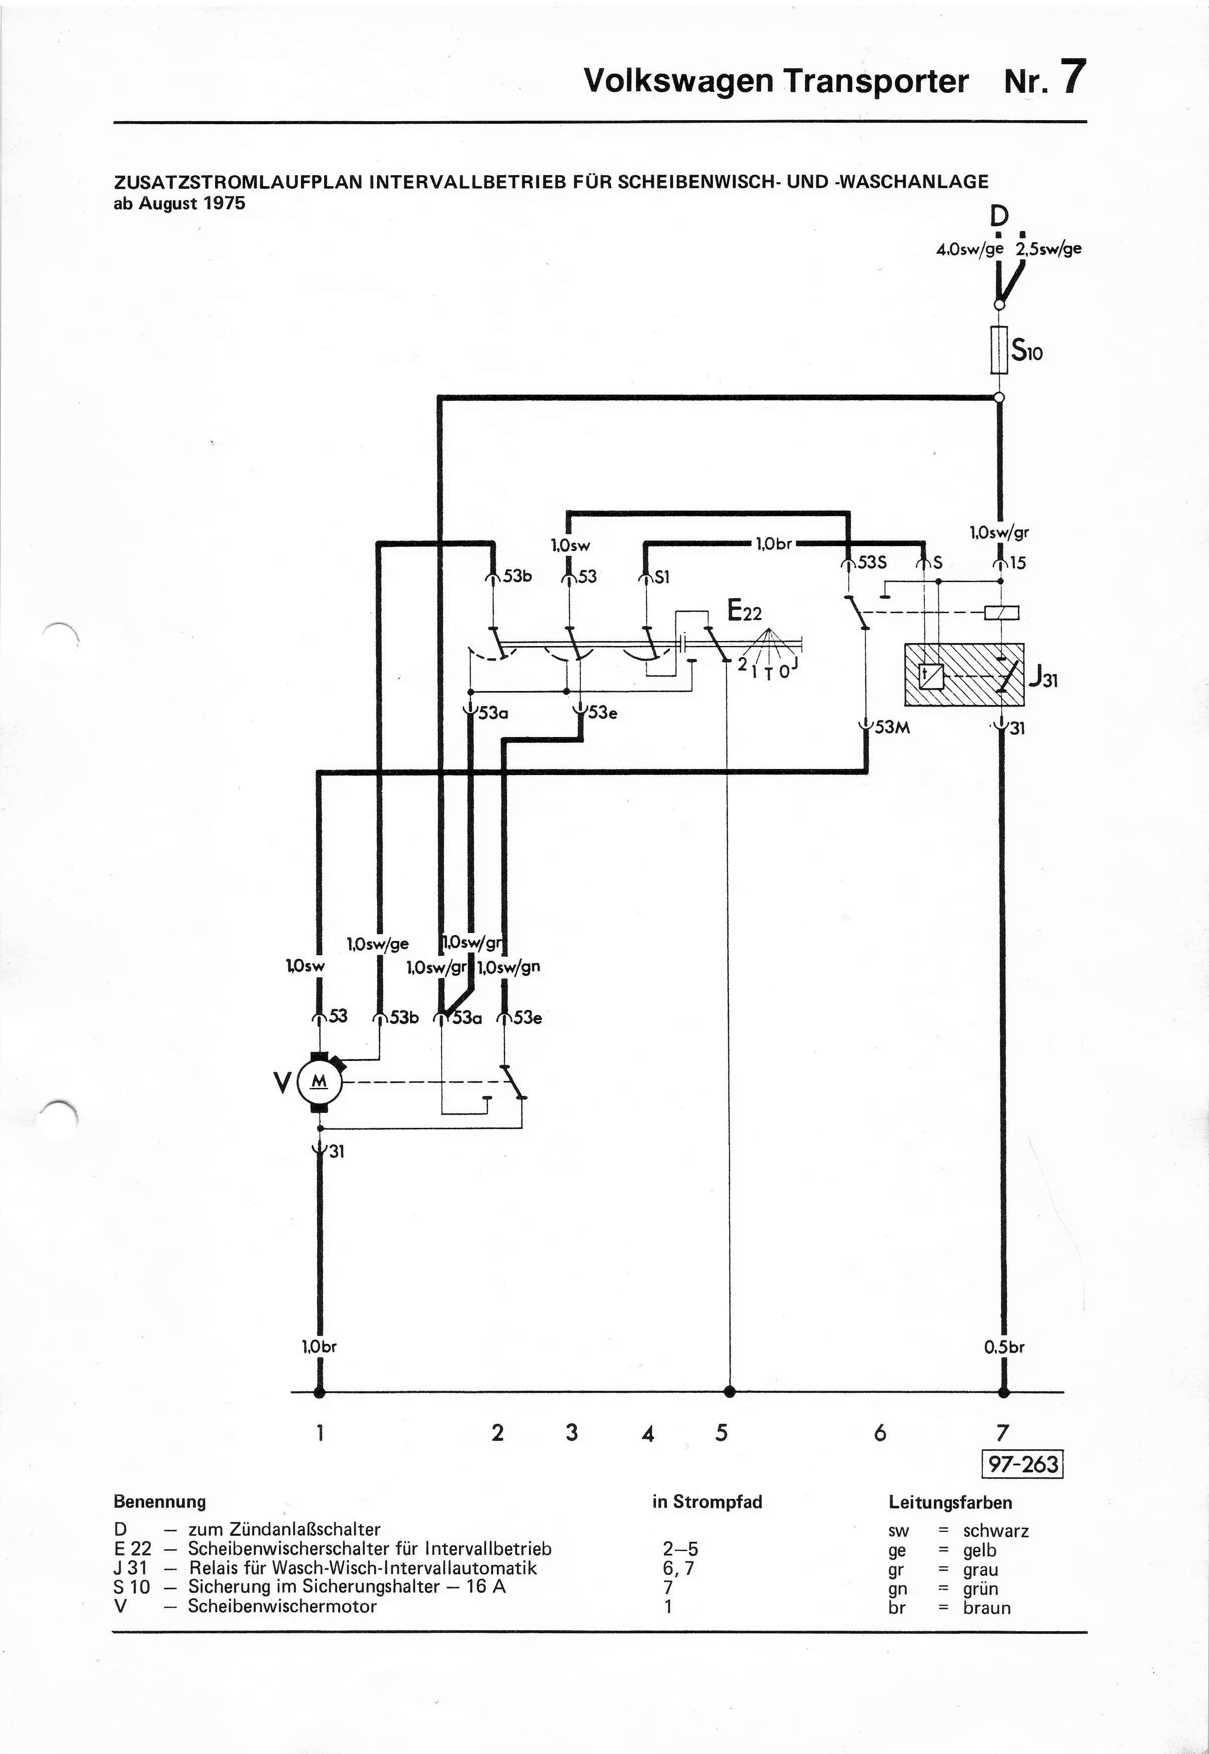 1975 08 vw t2 delay wiper wiring diagram?resize\=665%2C965 diagrams 15131142 phase linear uv8 wiring diagram jensen phase jensen vm9312 wiring harness diagram at eliteediting.co